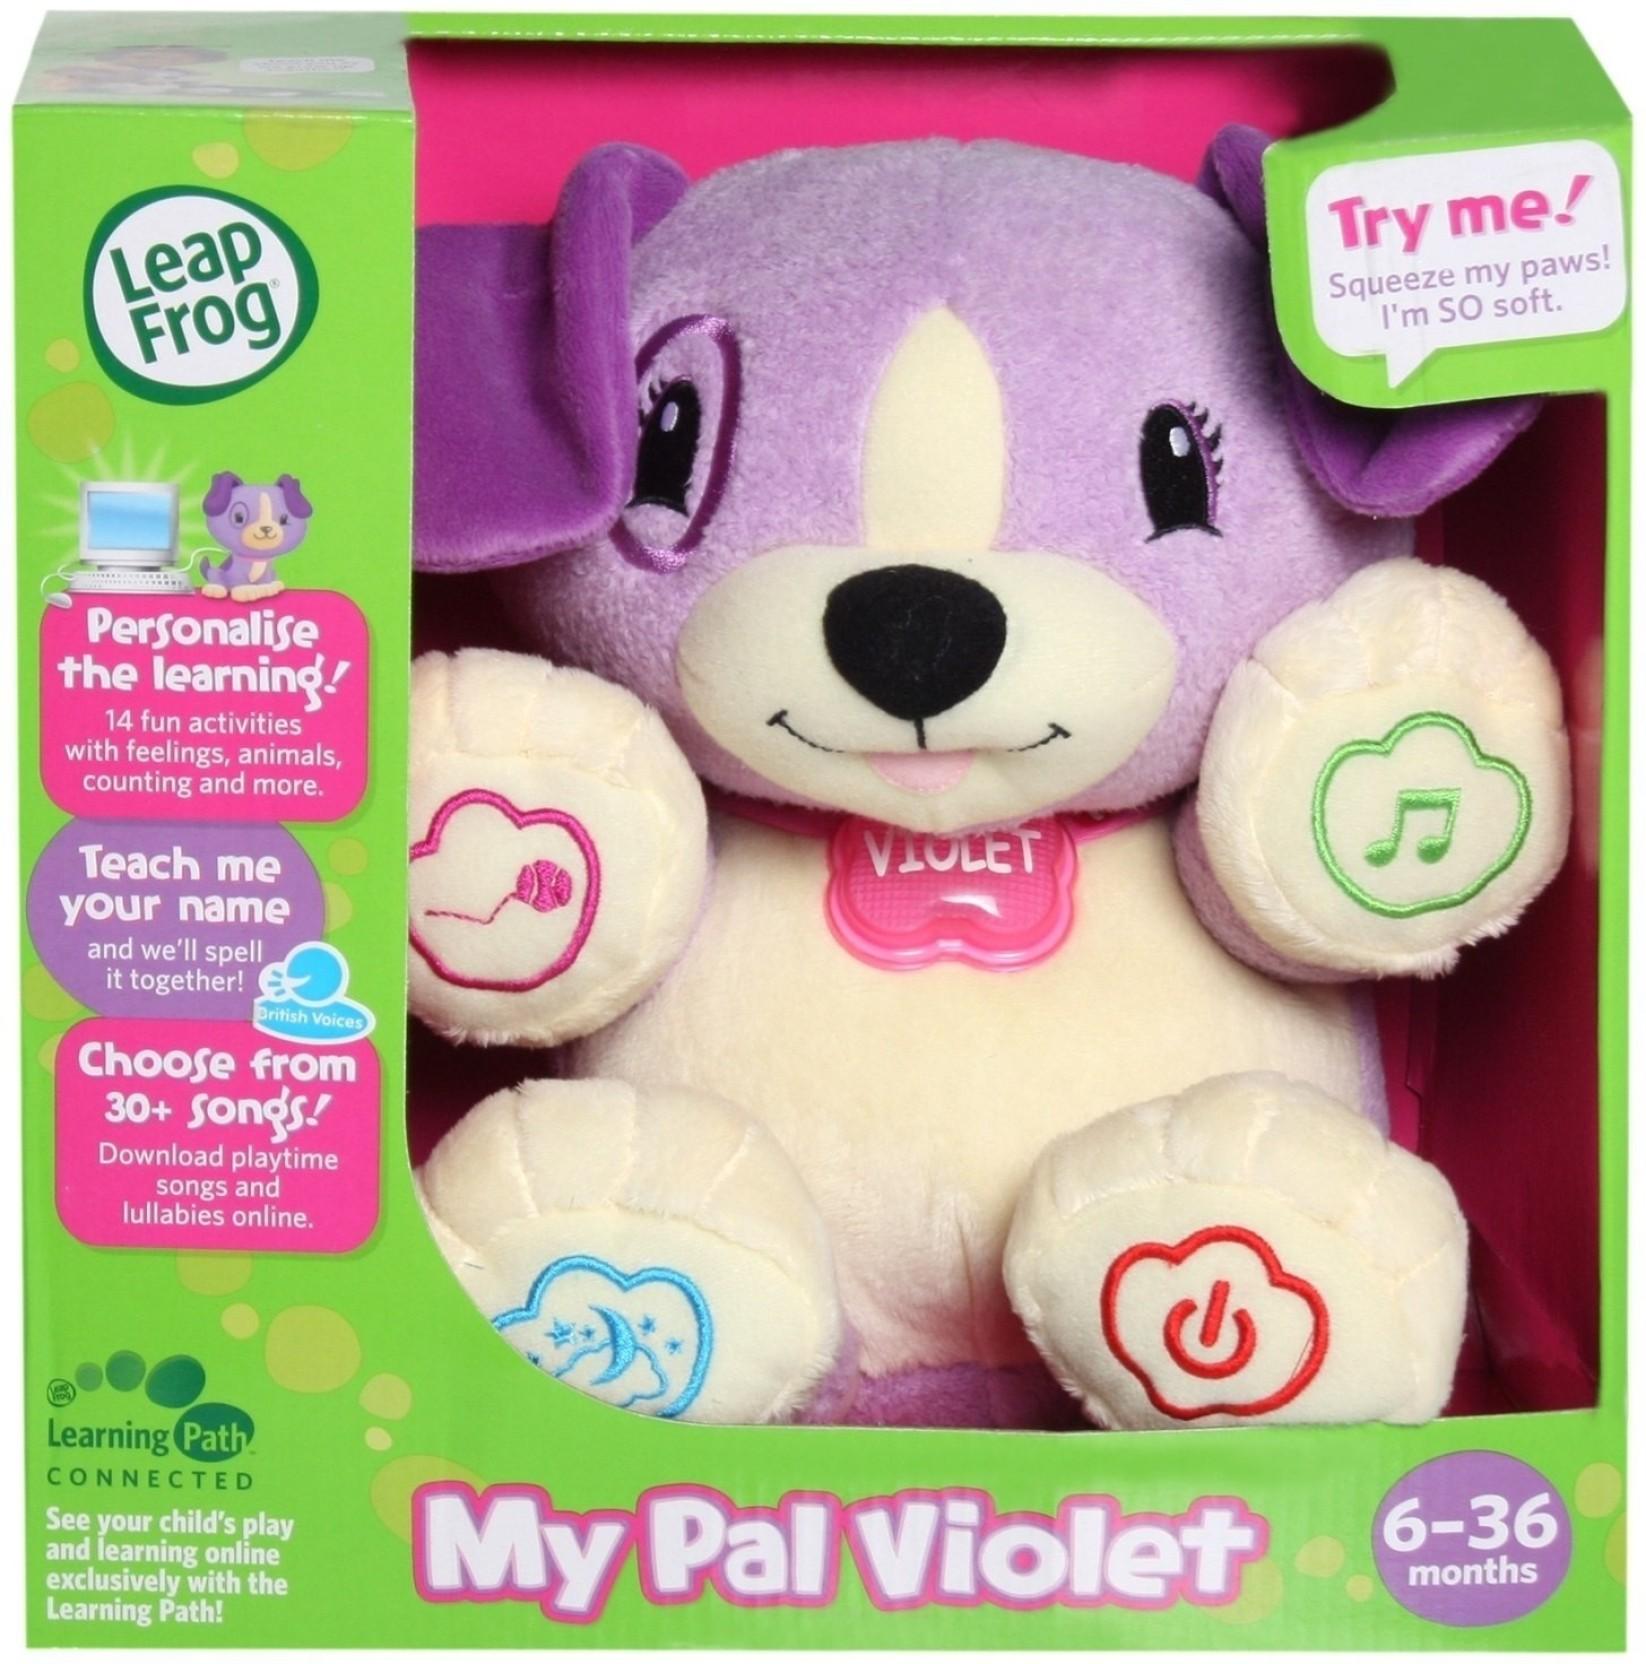 My Pal Violet Recall